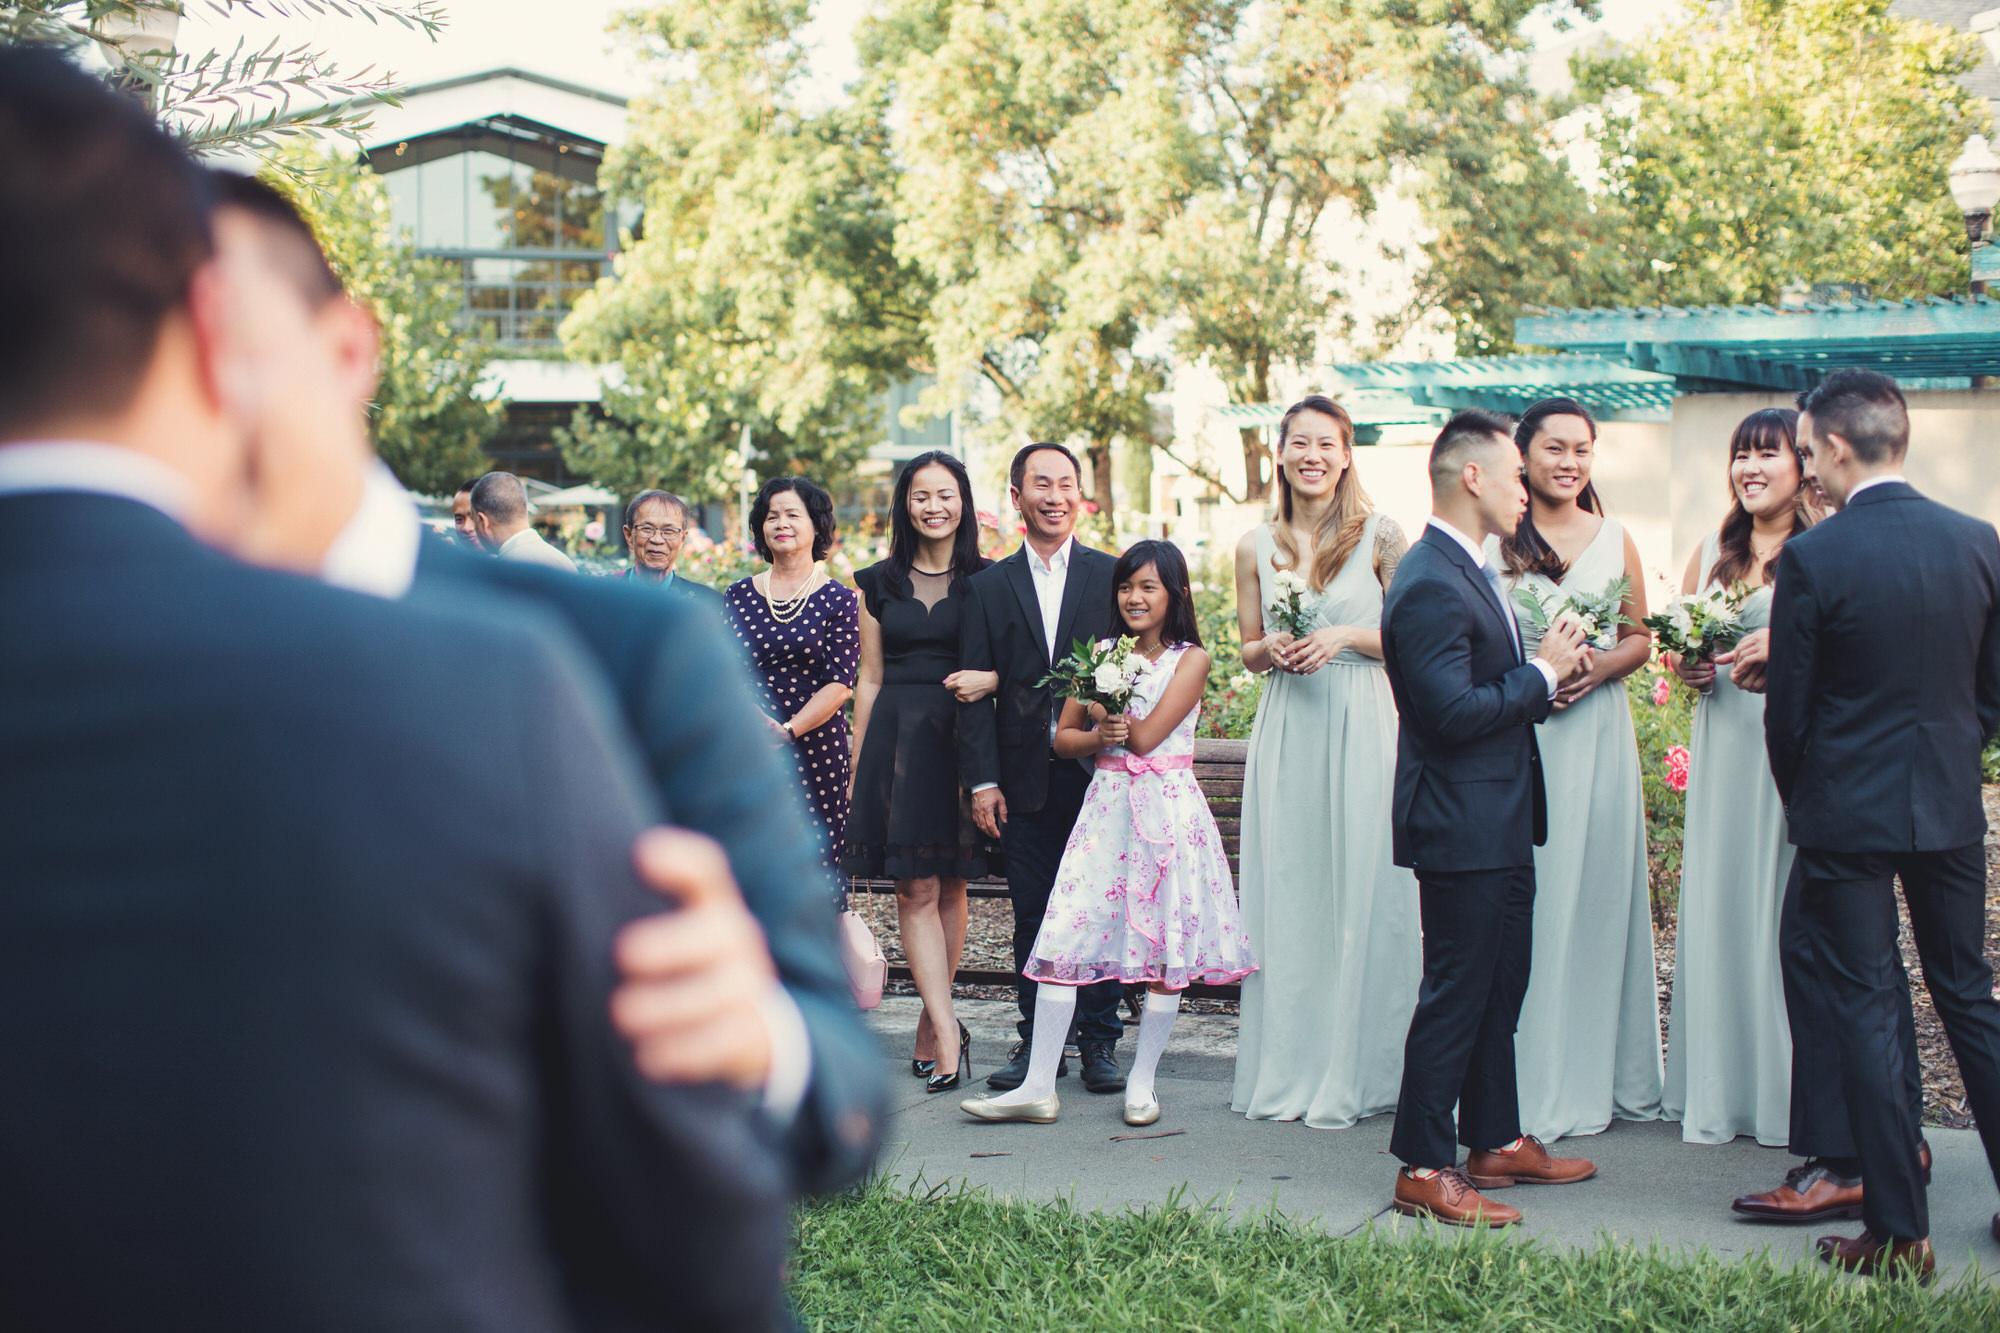 Candid wedding photographer bay area napa valley